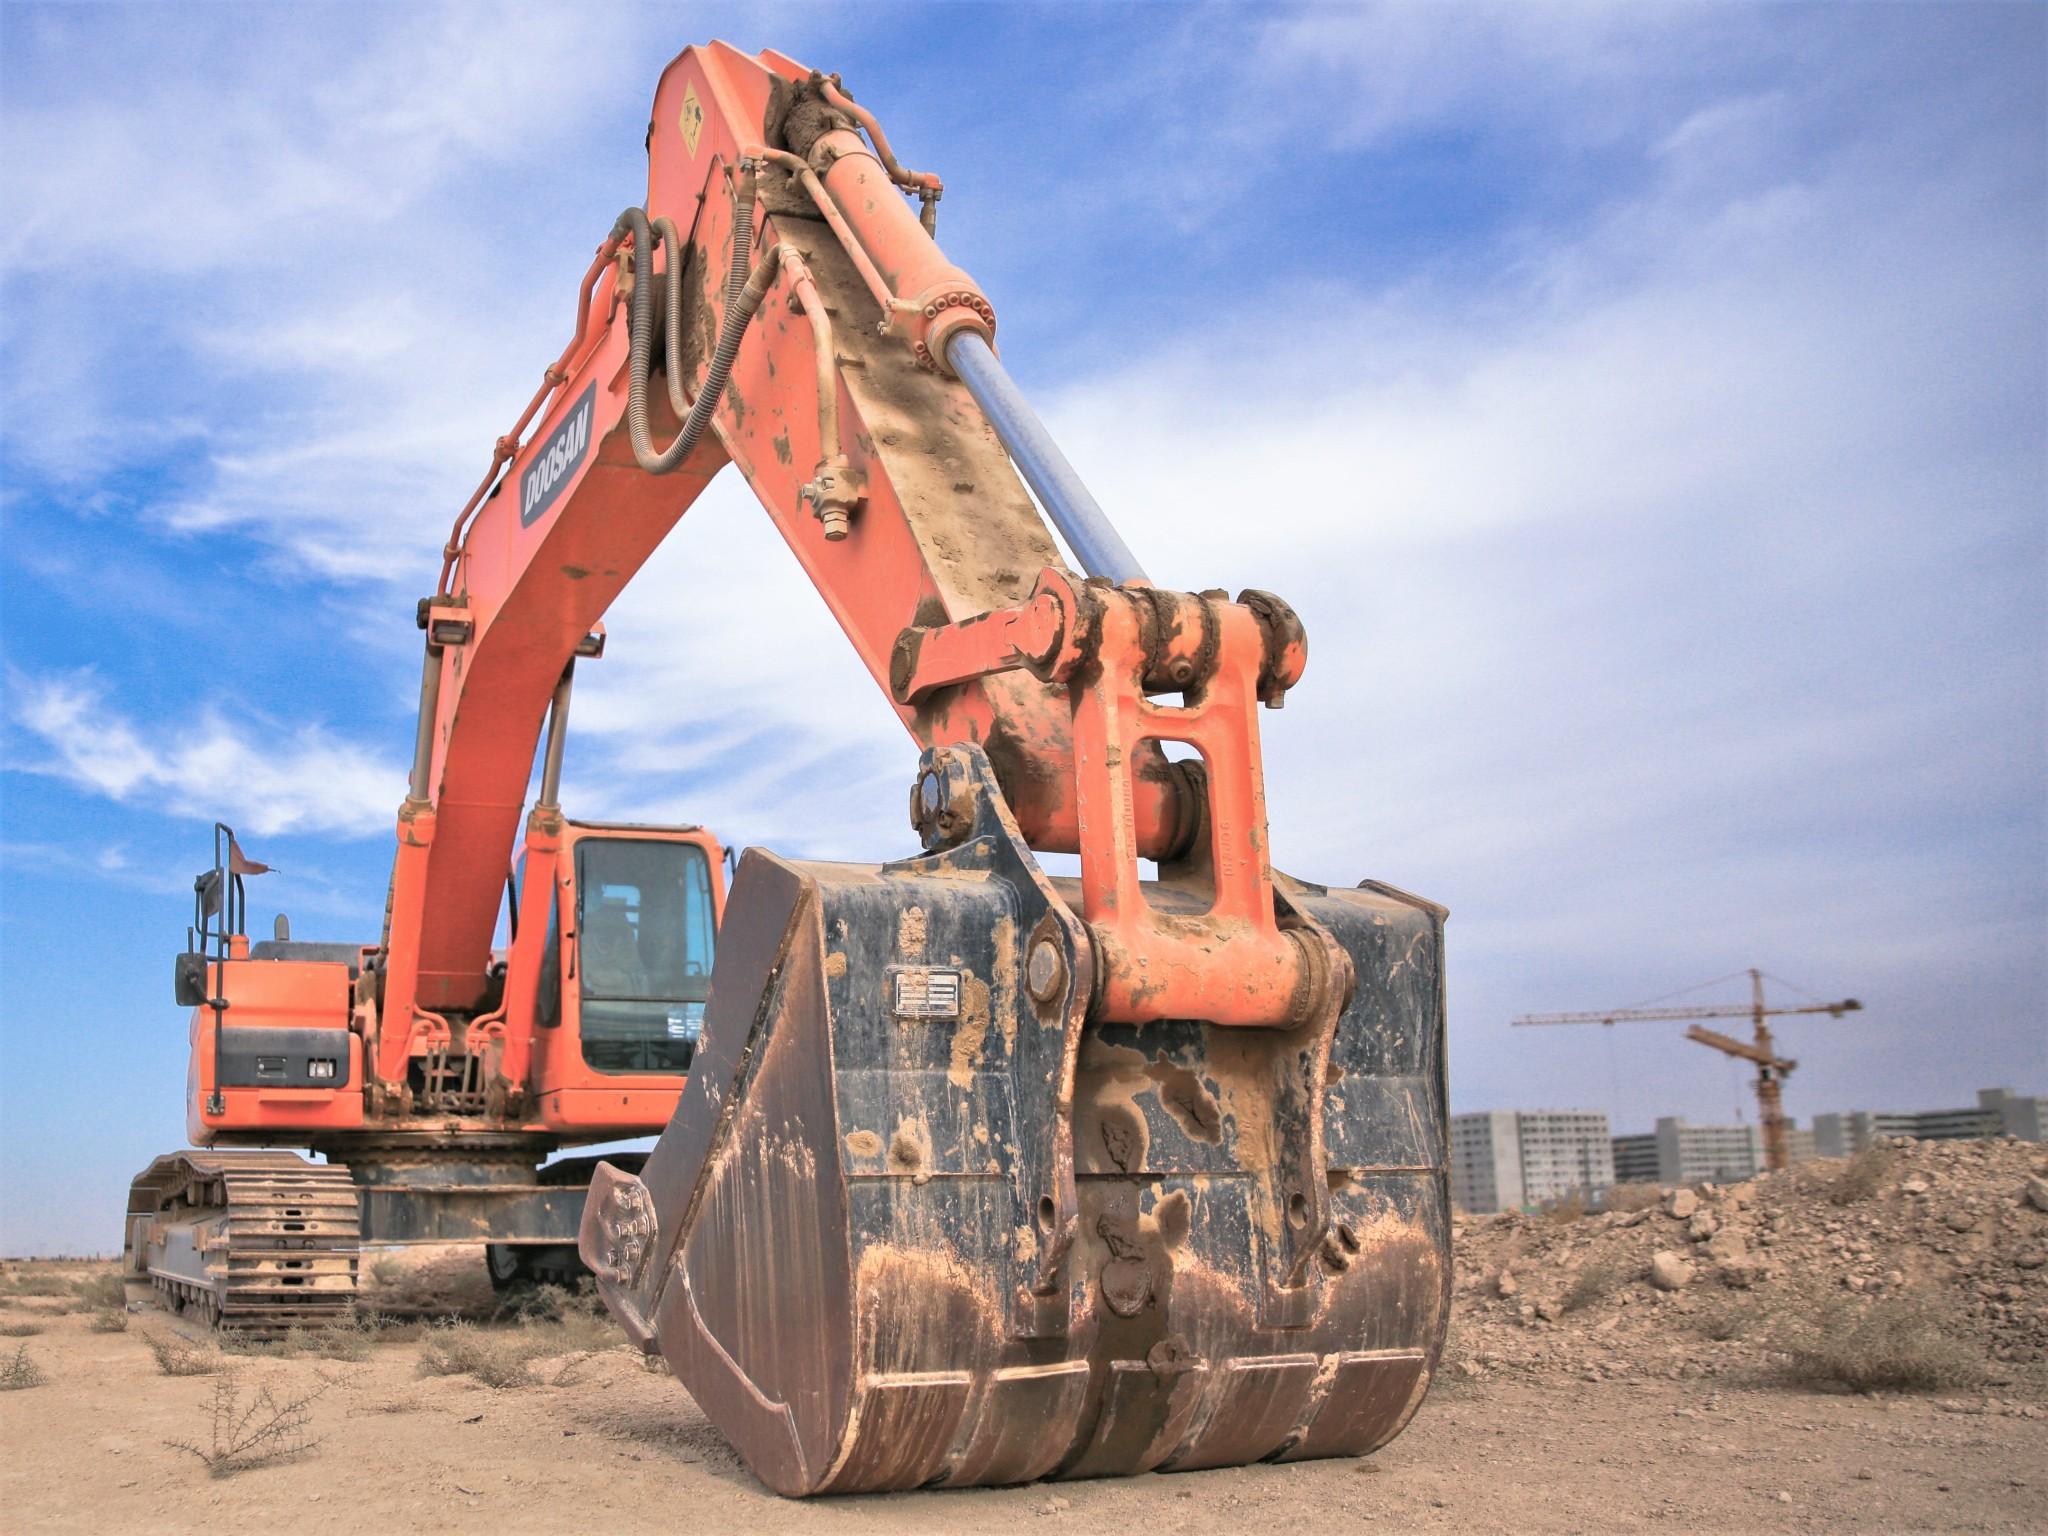 A large orange mechanical digger excavating a construction site for urban development.